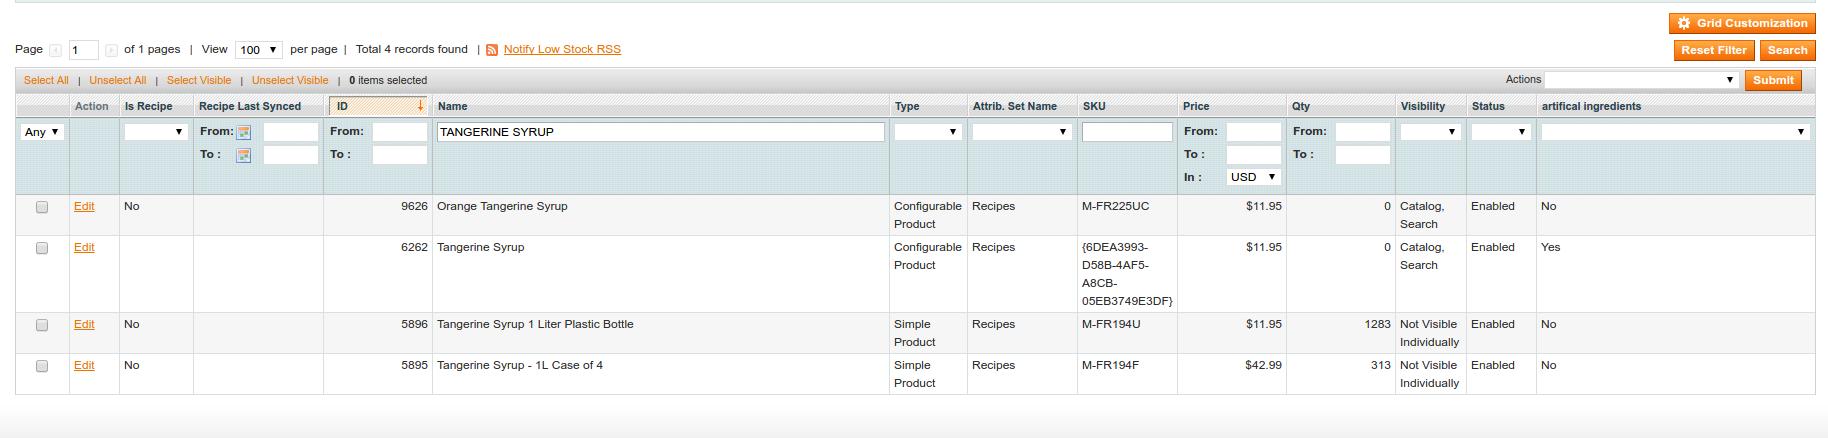 Hidden Pitfalls of SOLR Search in Magento Enterprise